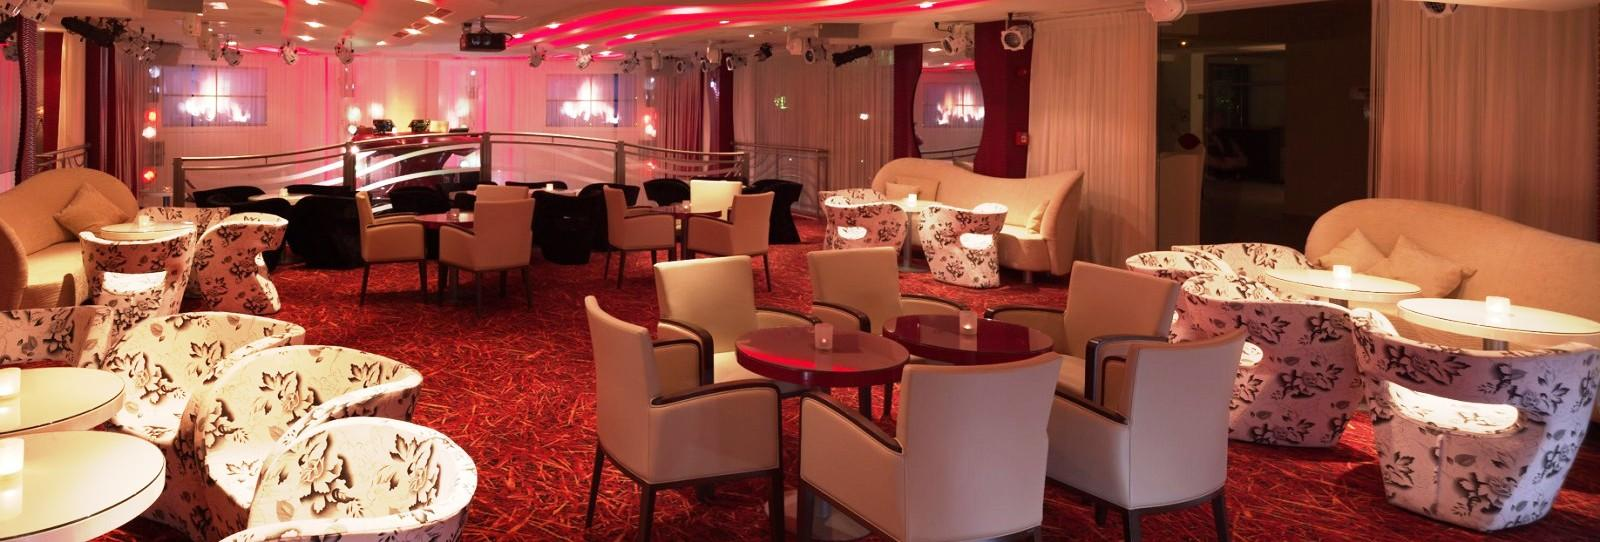 отель фламинго гранд 5 албена болгария